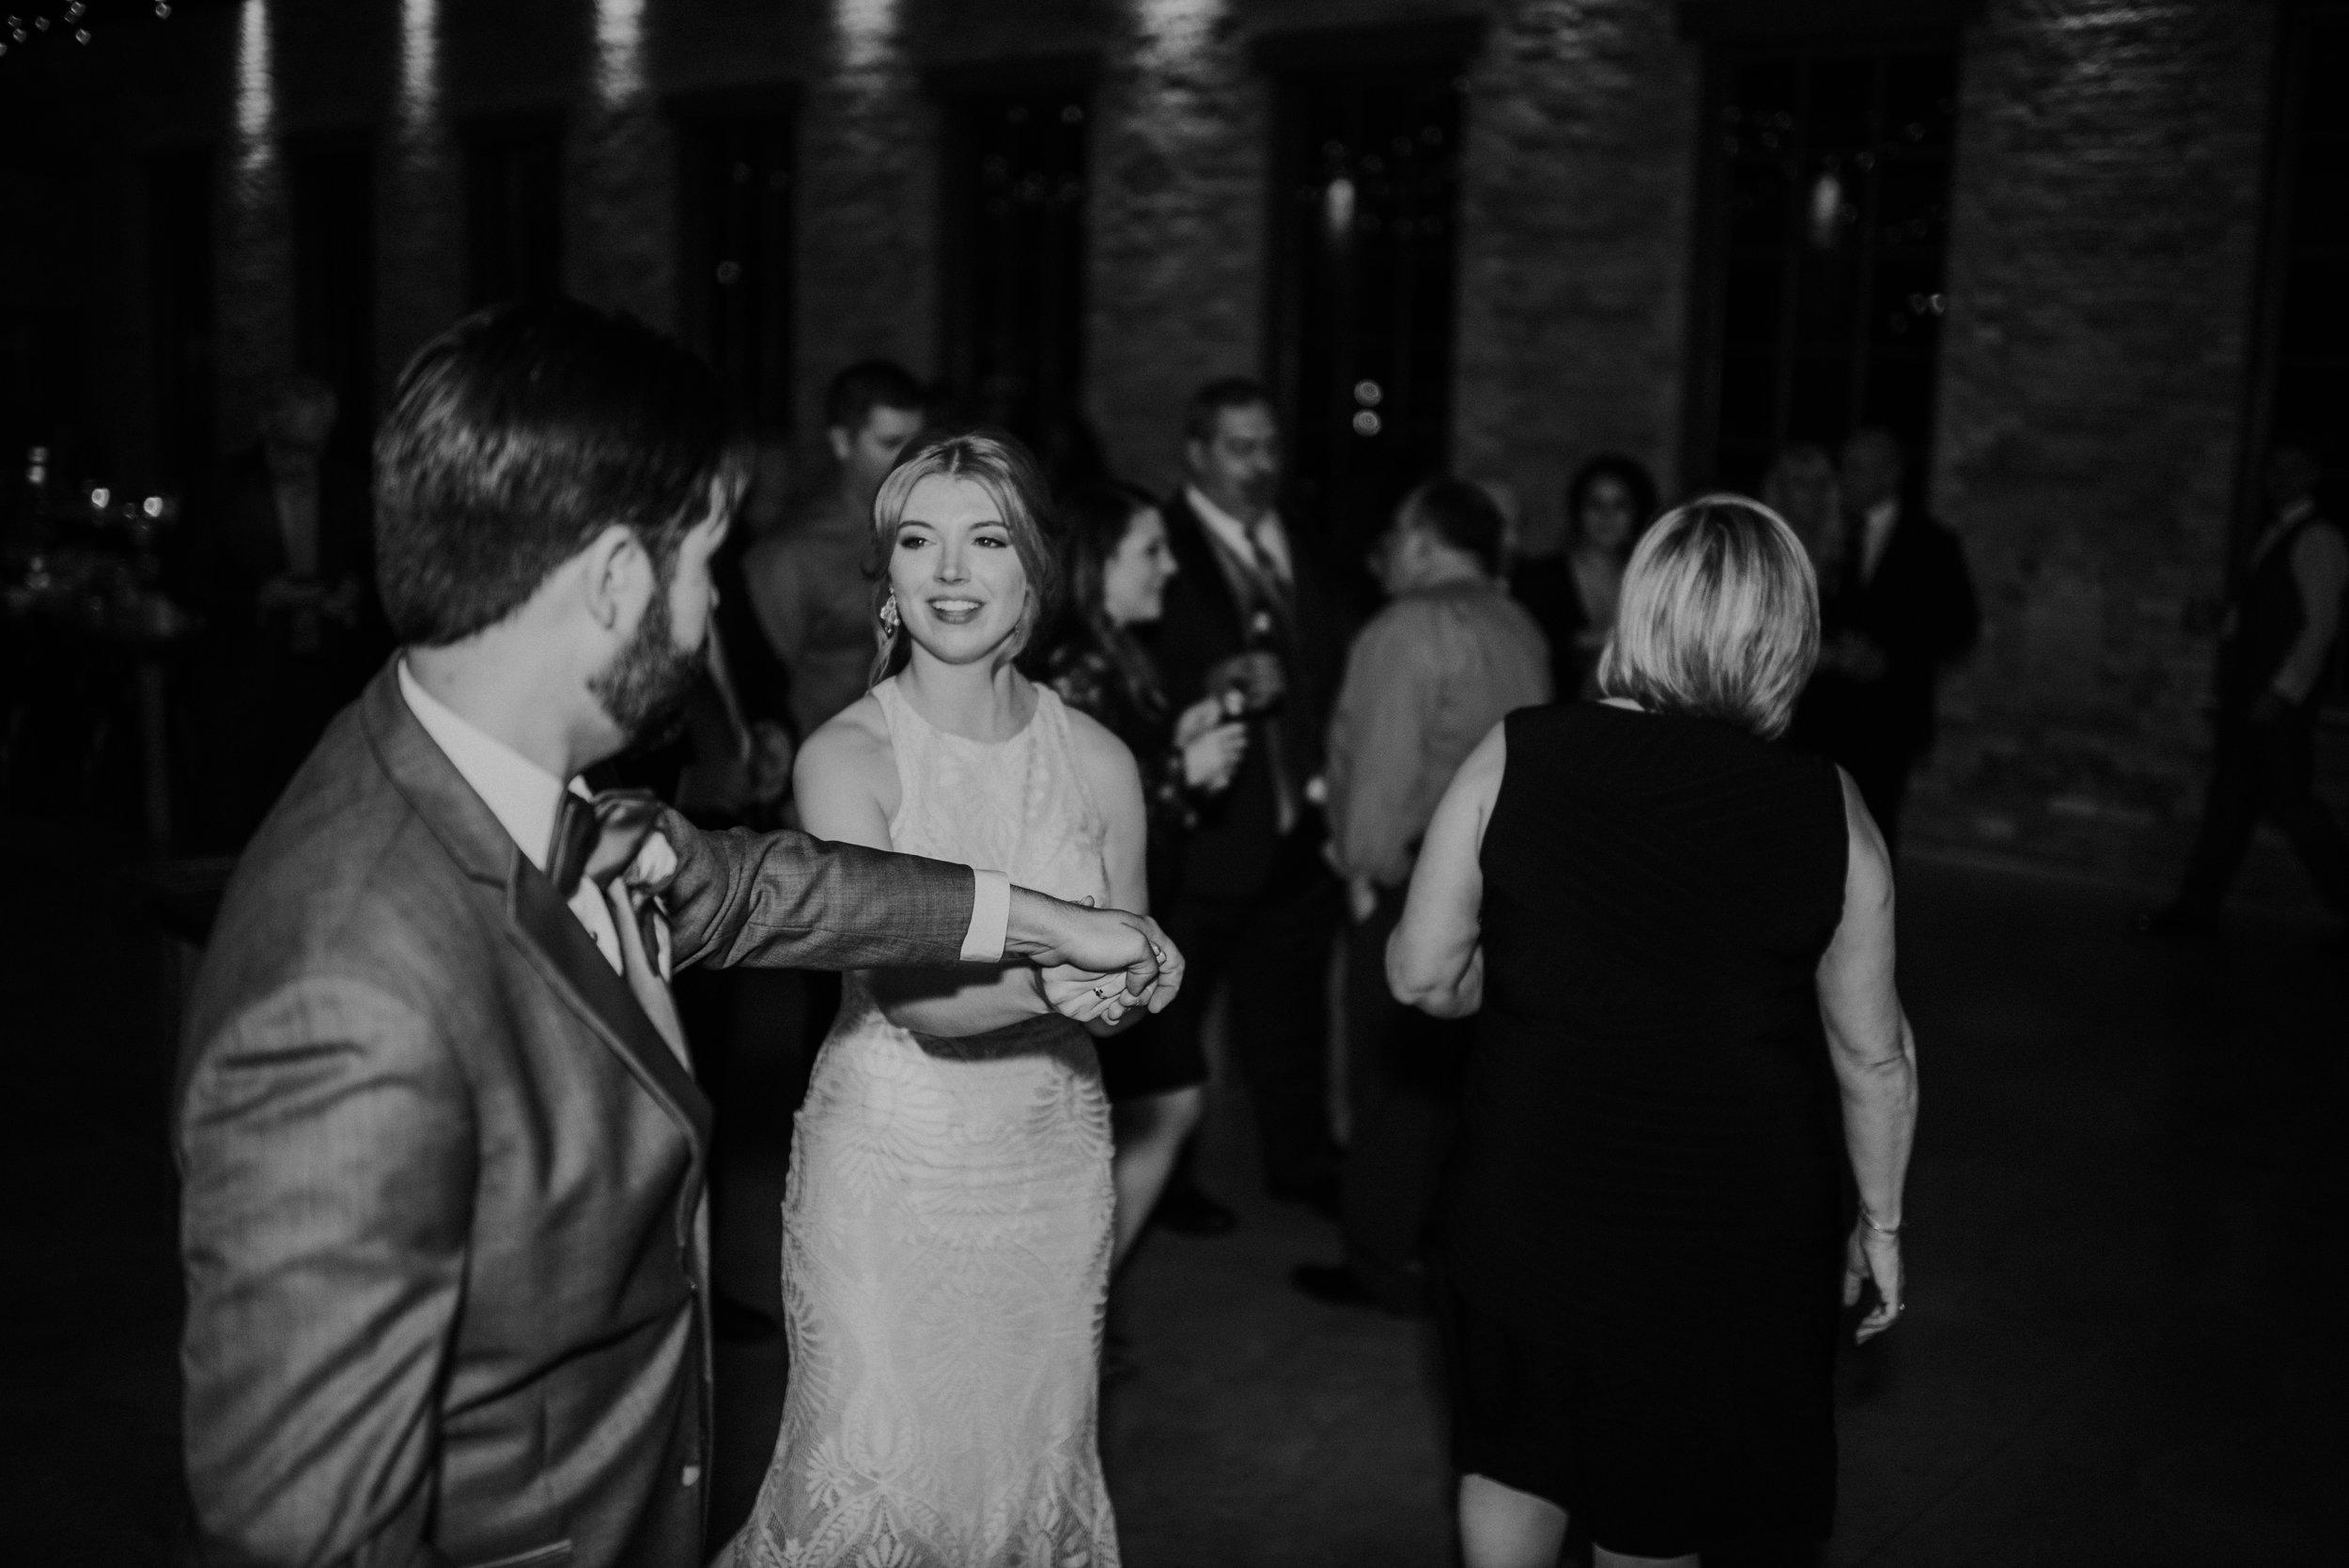 The Brix on Fox, Chicago Wedding Photographer, Zach and Rosalie00092.jpg